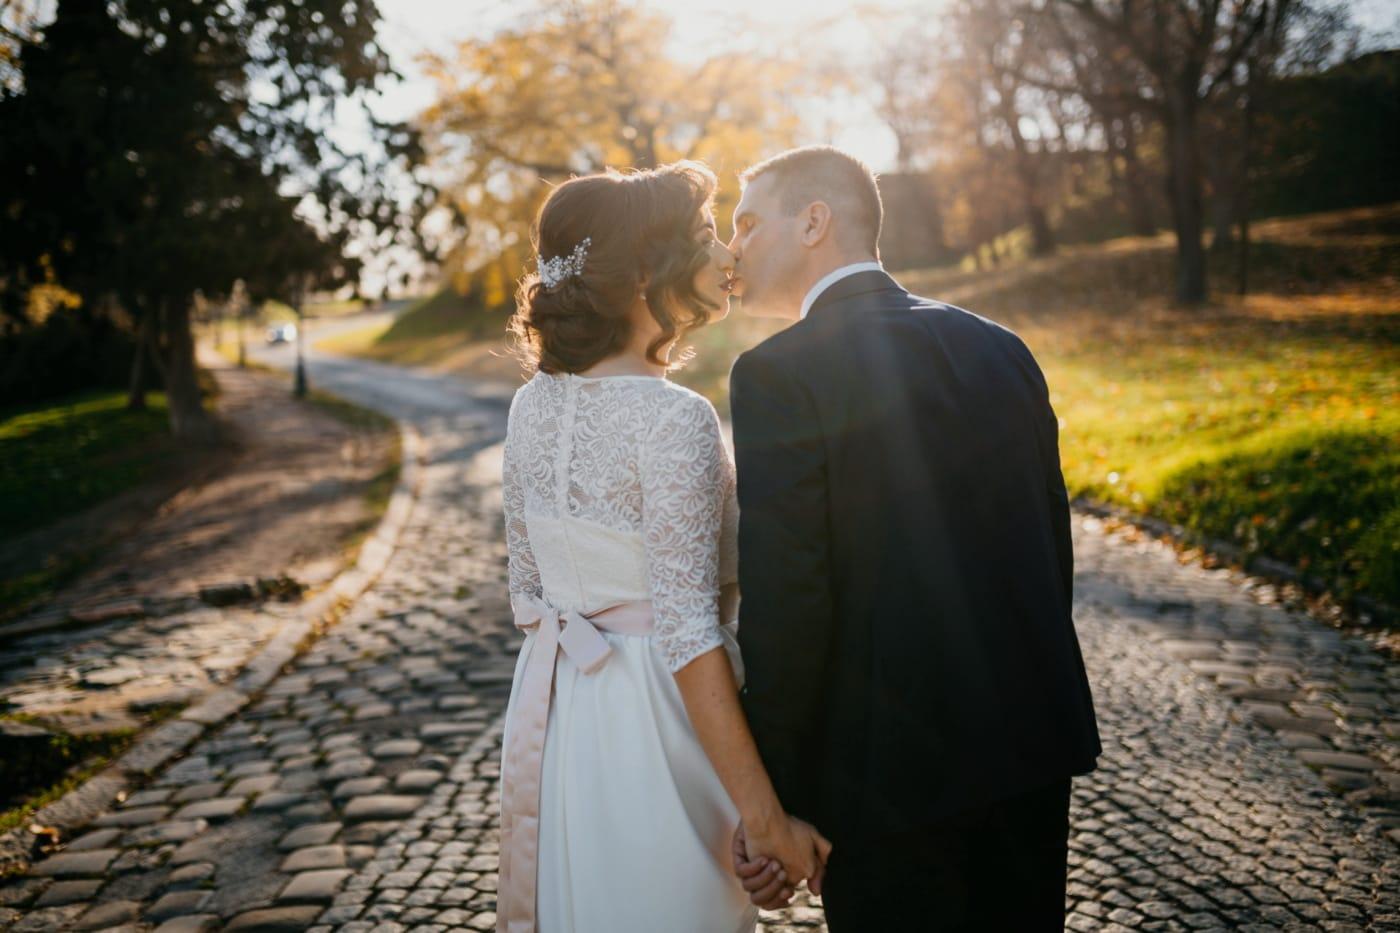 love date, tenderness, emotion, love, kiss, sunrays, marriage, embrace, groom, wedding